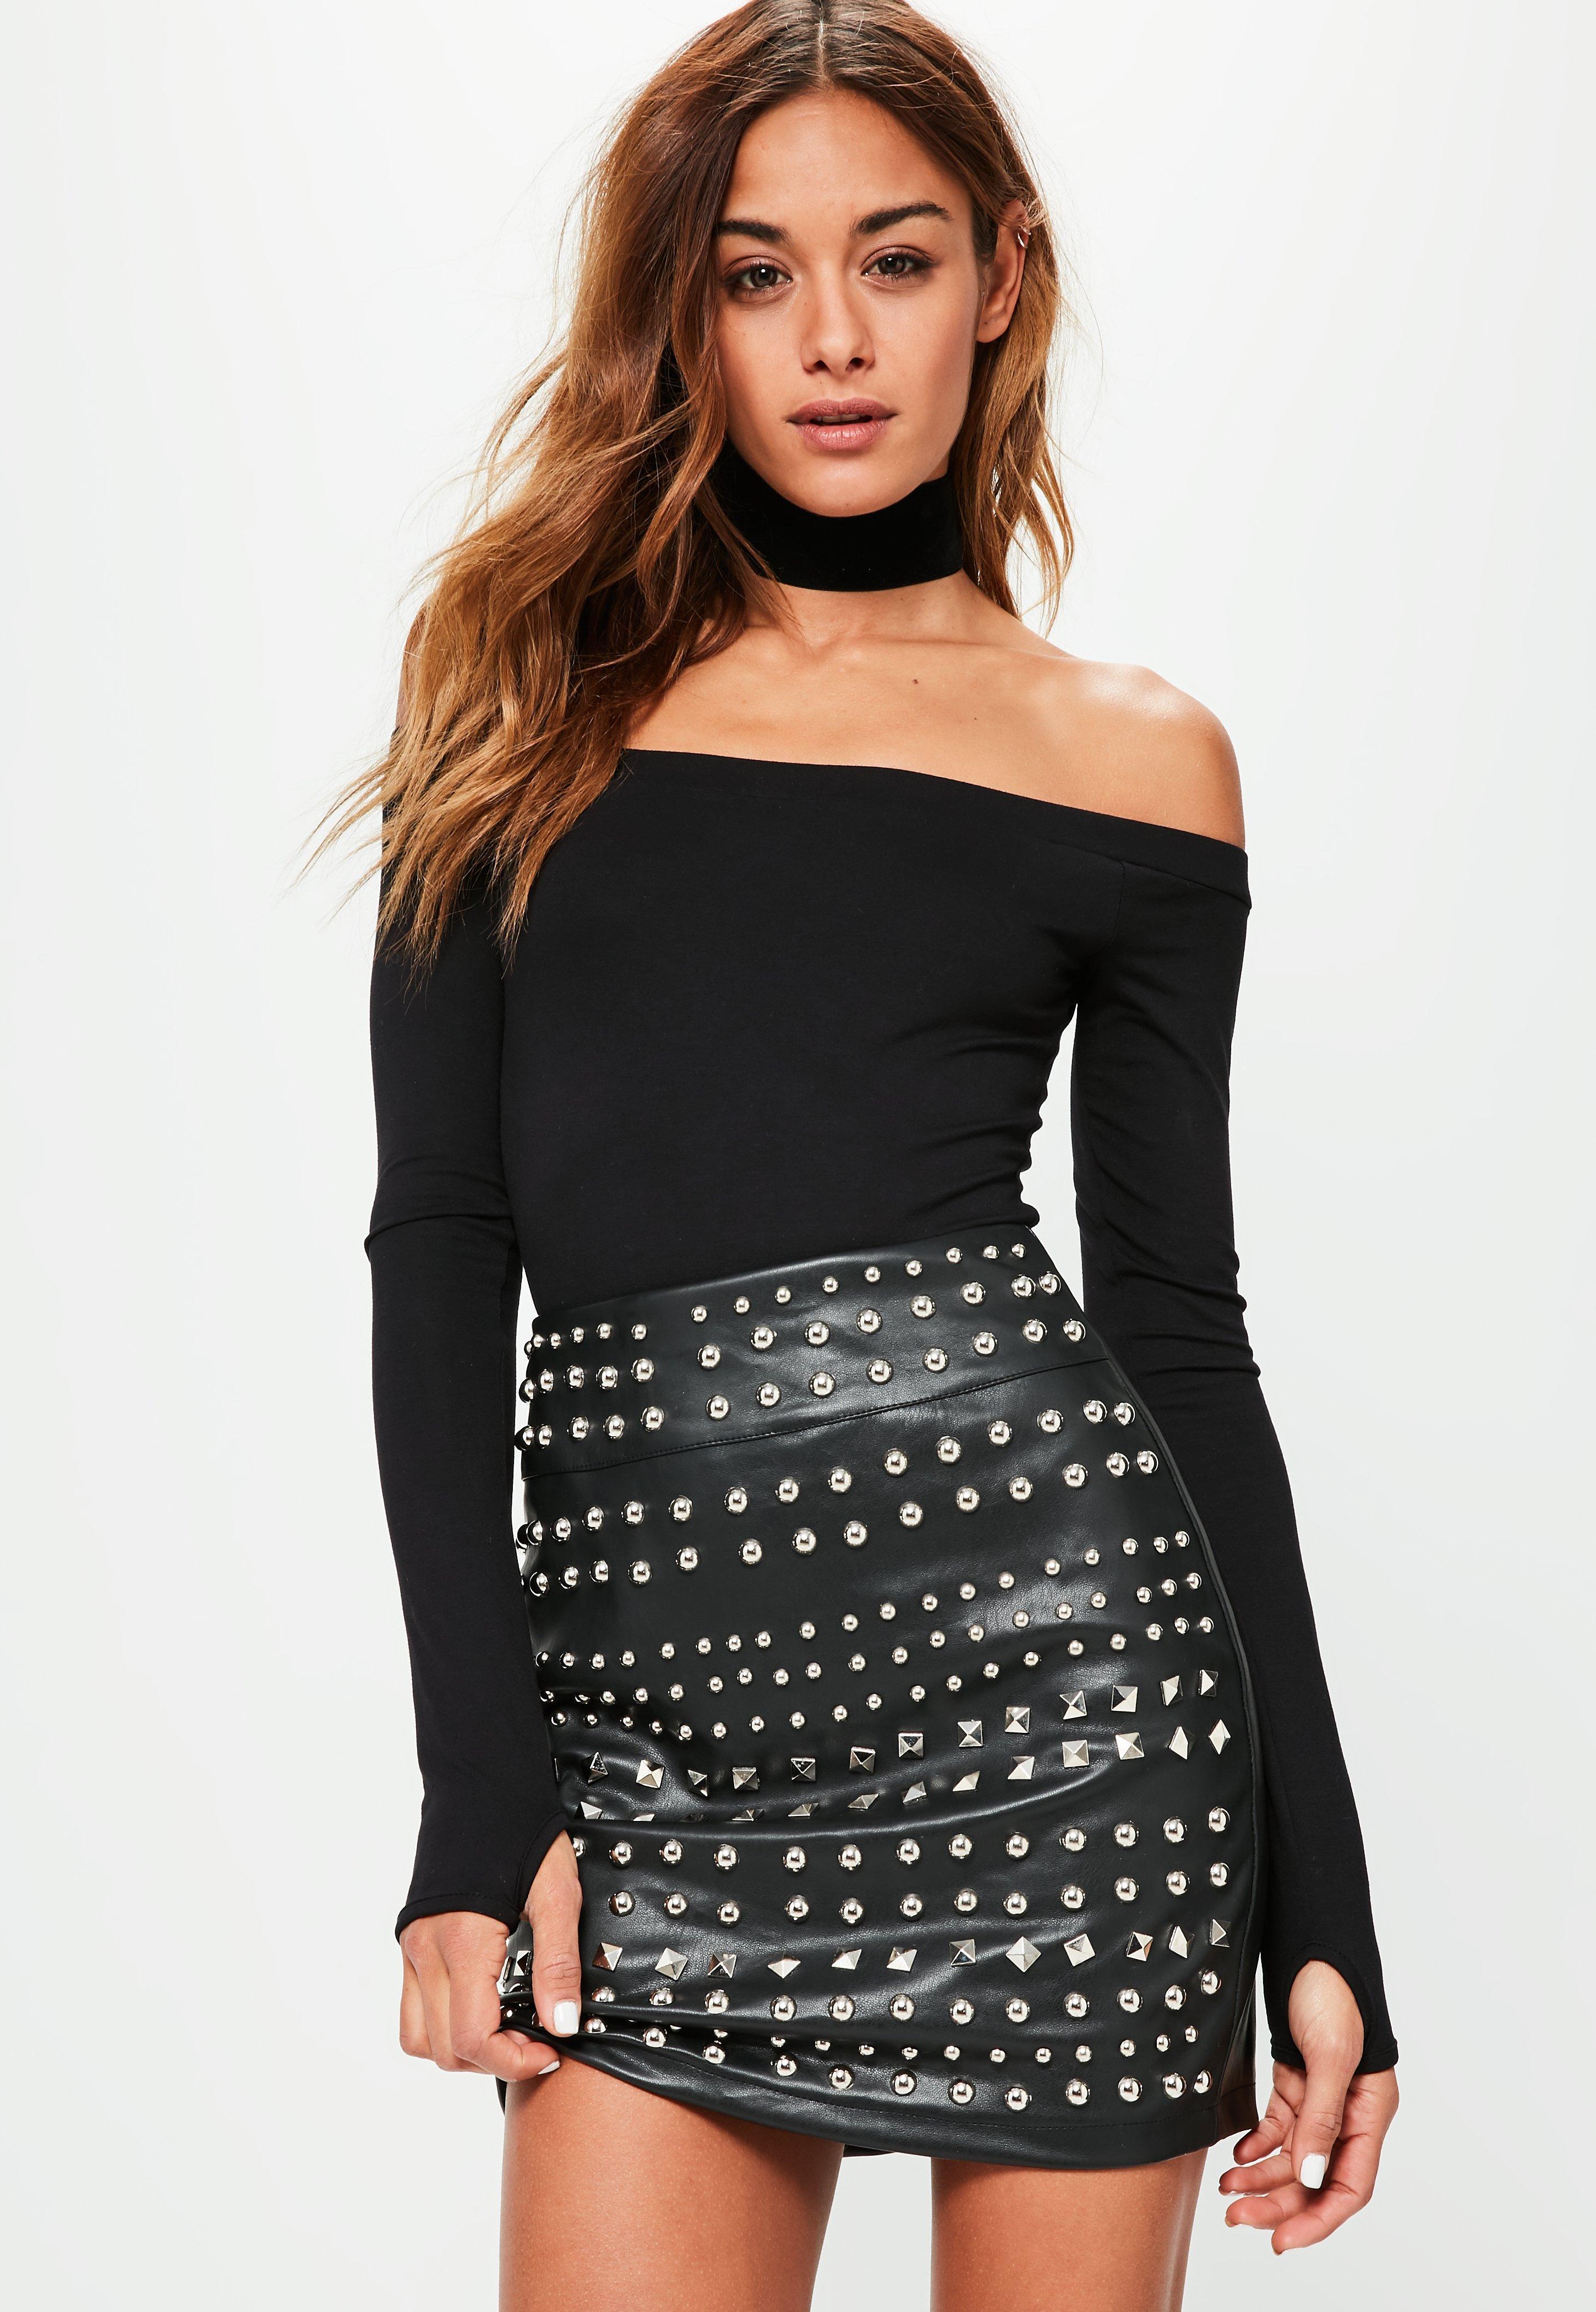 67d77b2b74 Missguided Black Bardot Long Sleeve Bodysuit in Black - Save ...